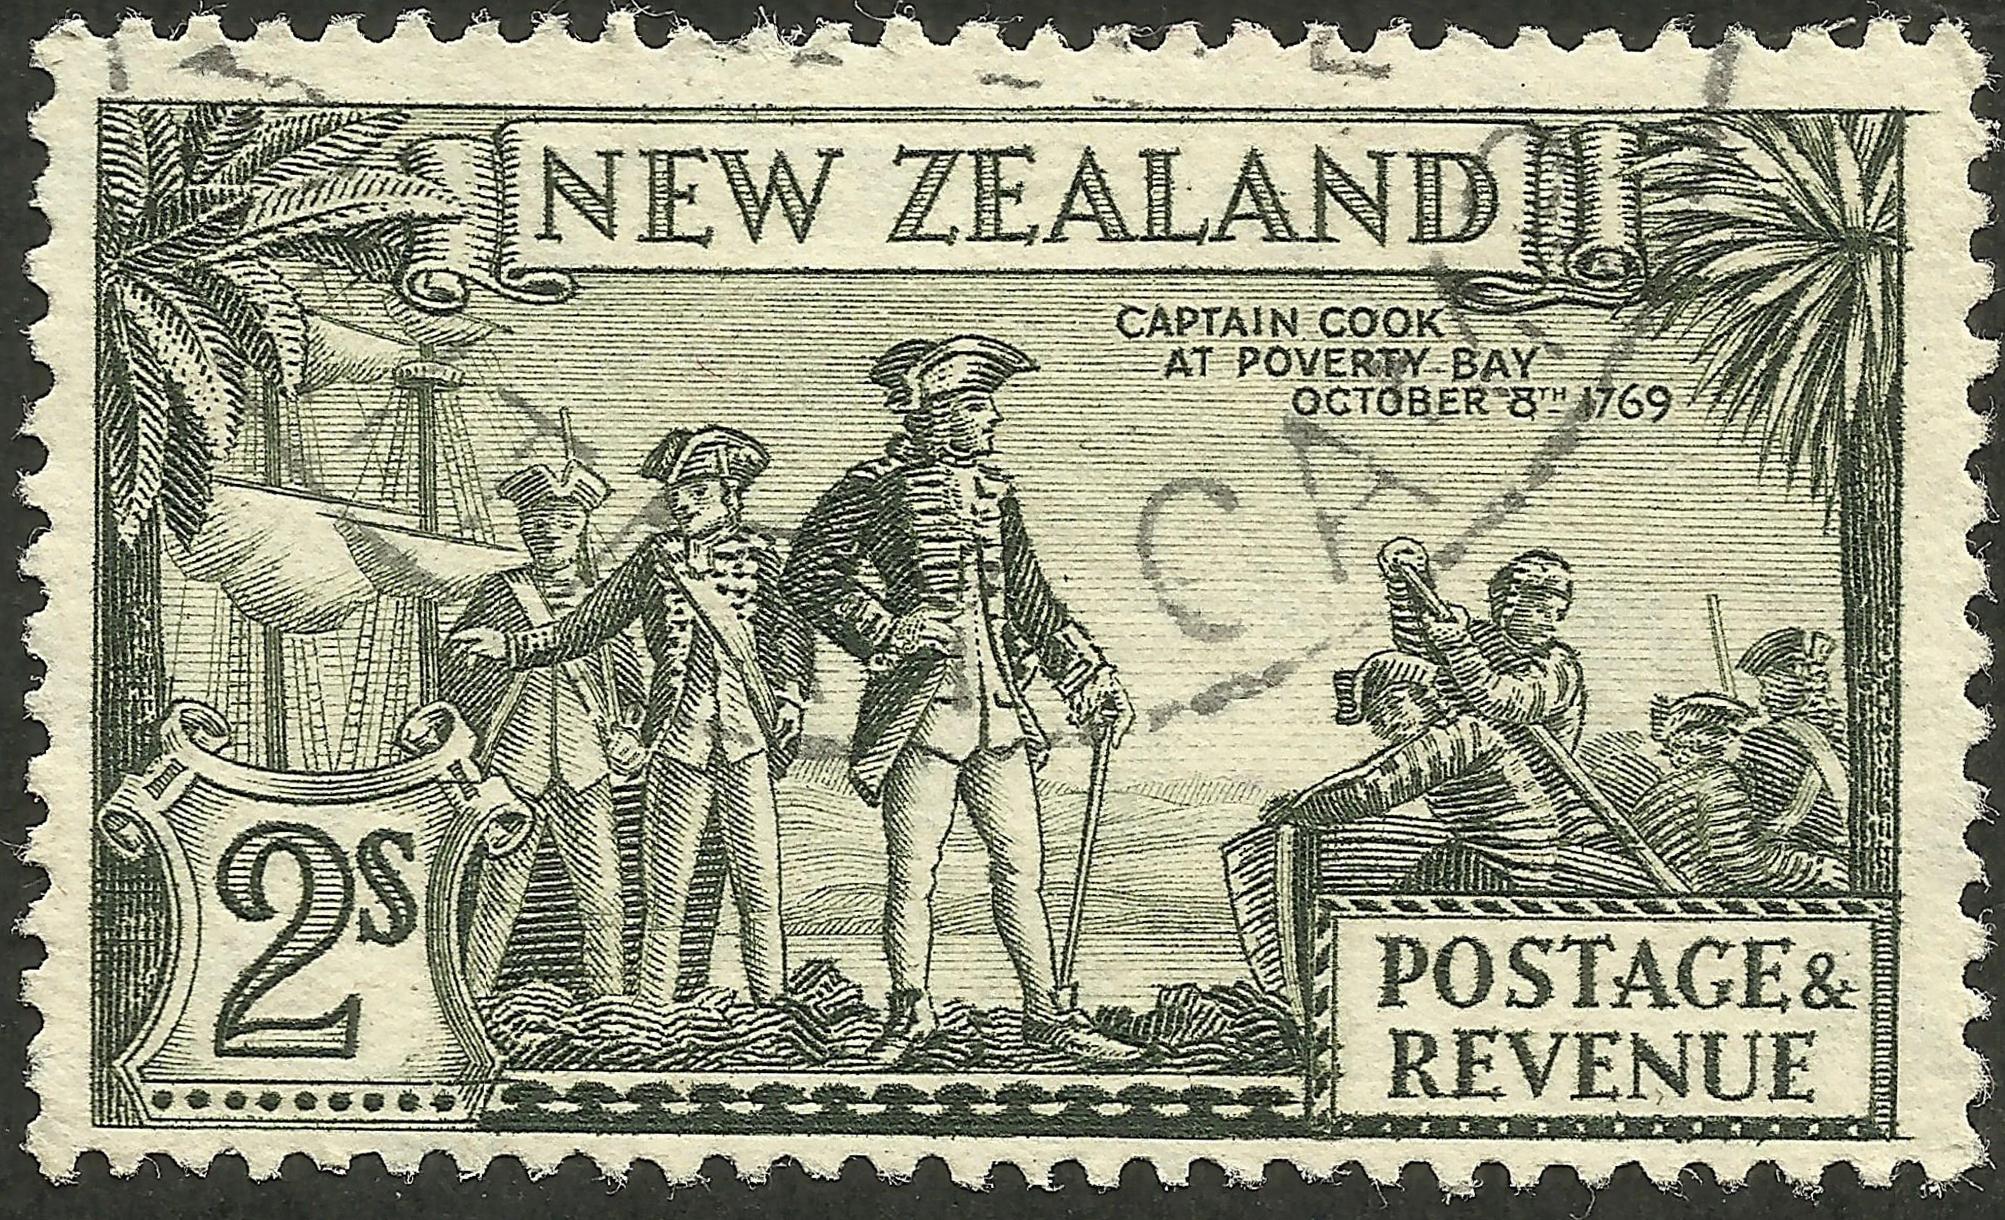 New Zealand - Scott #215 (1936)